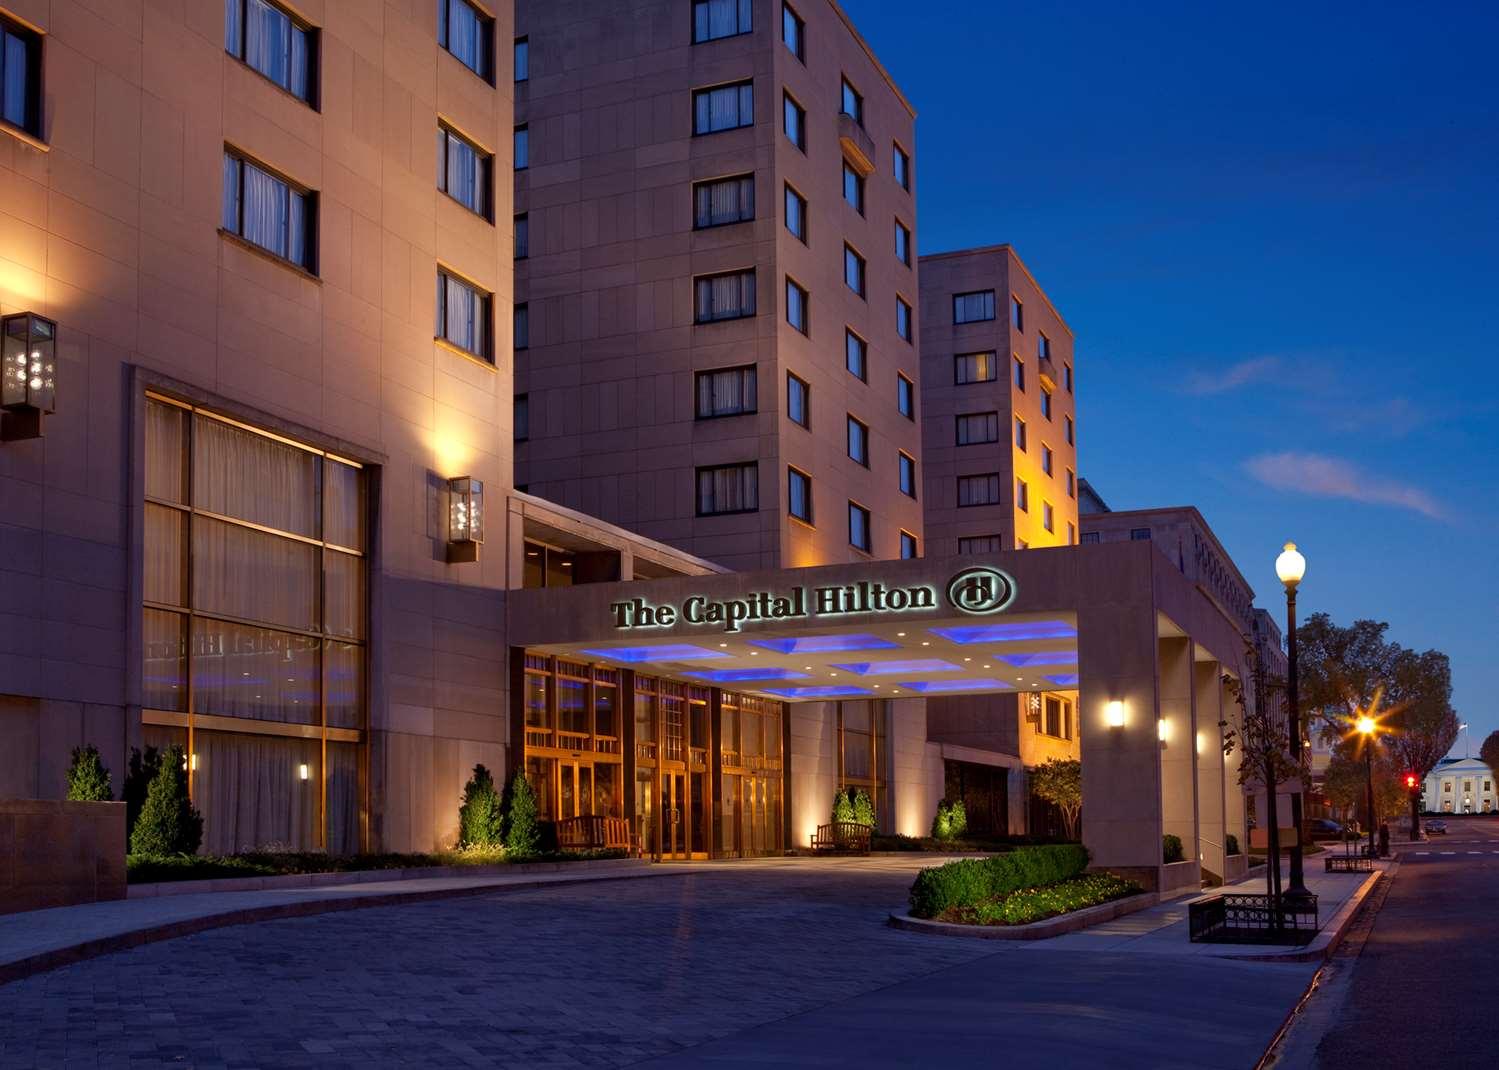 Exterior view - Capitol Hilton Hotel DC